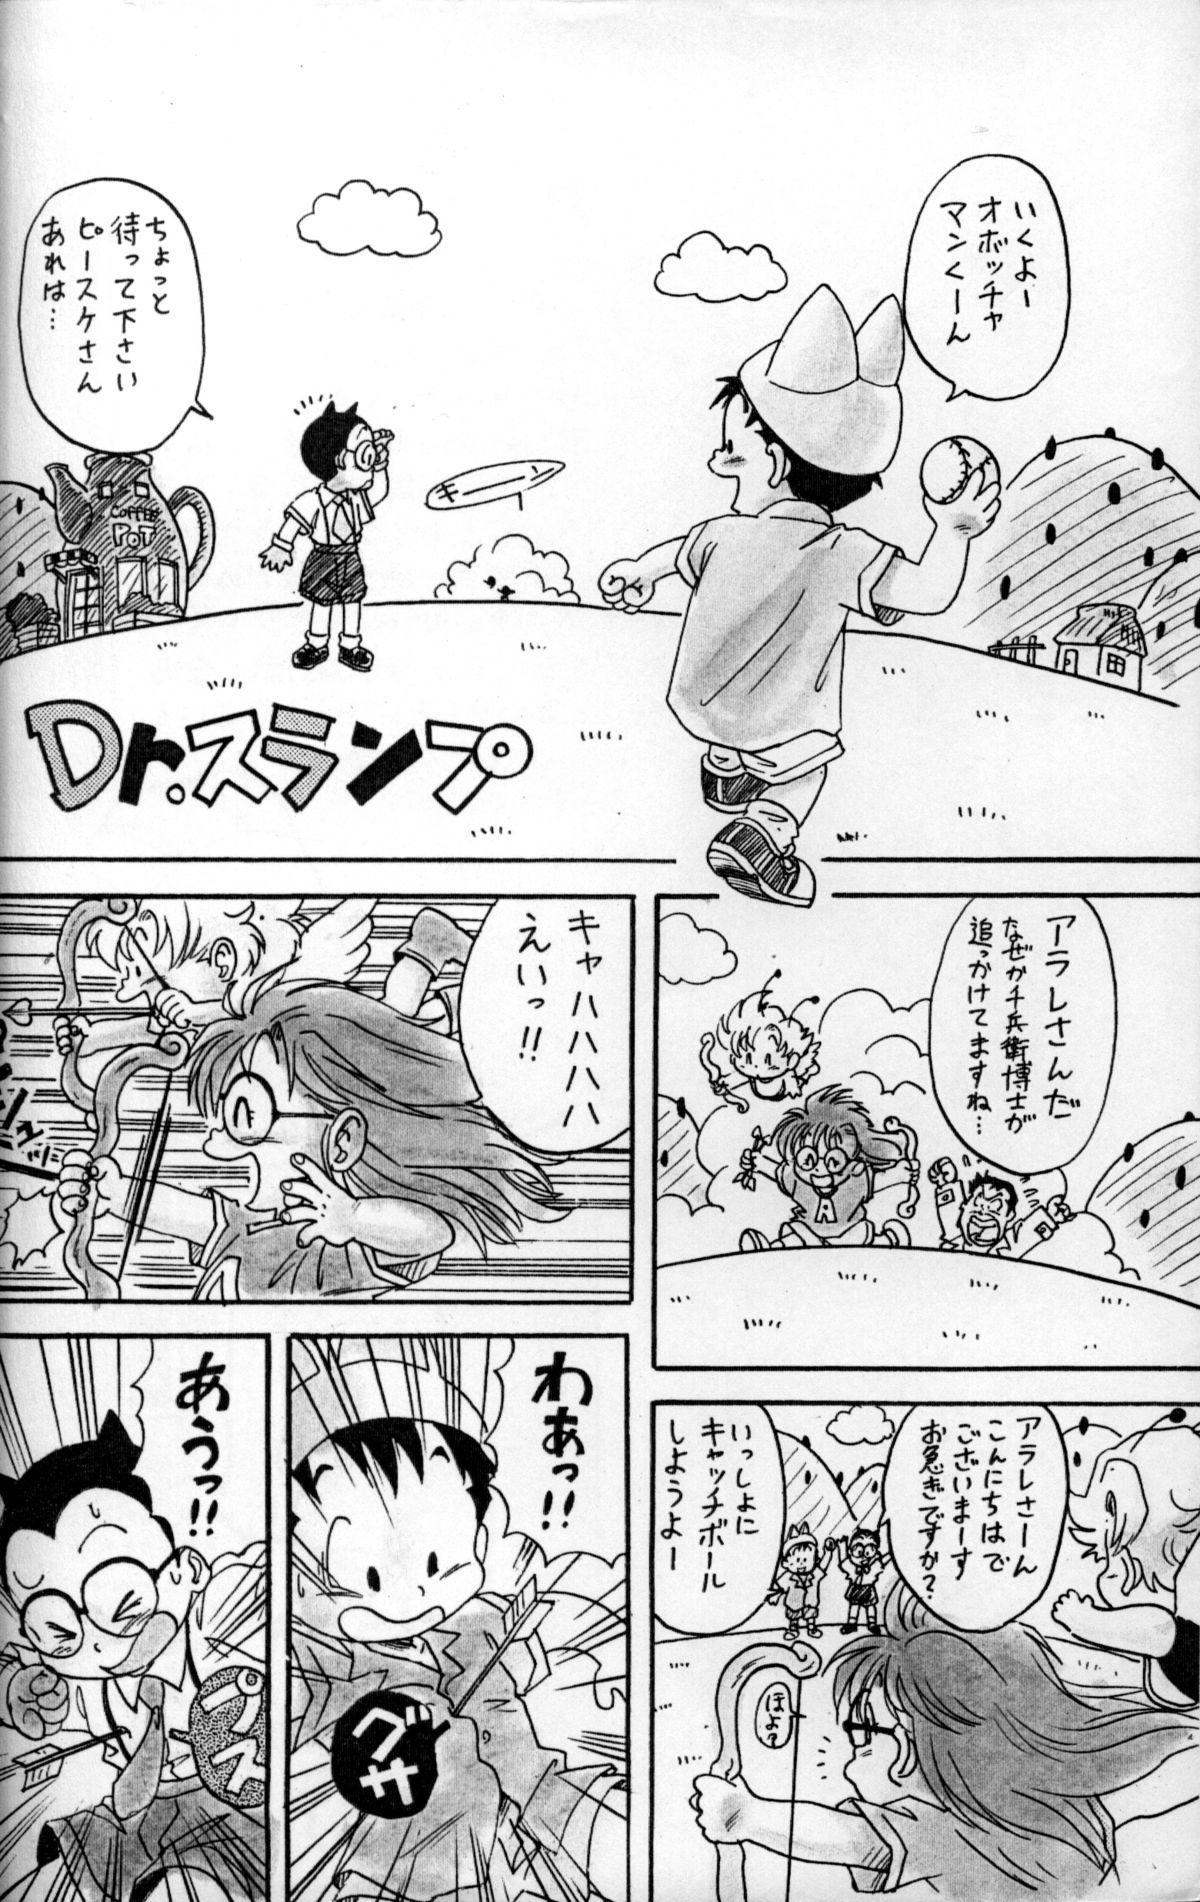 Mitsui Jun - Dreamer's Only - Anime Shota Character Mix 2